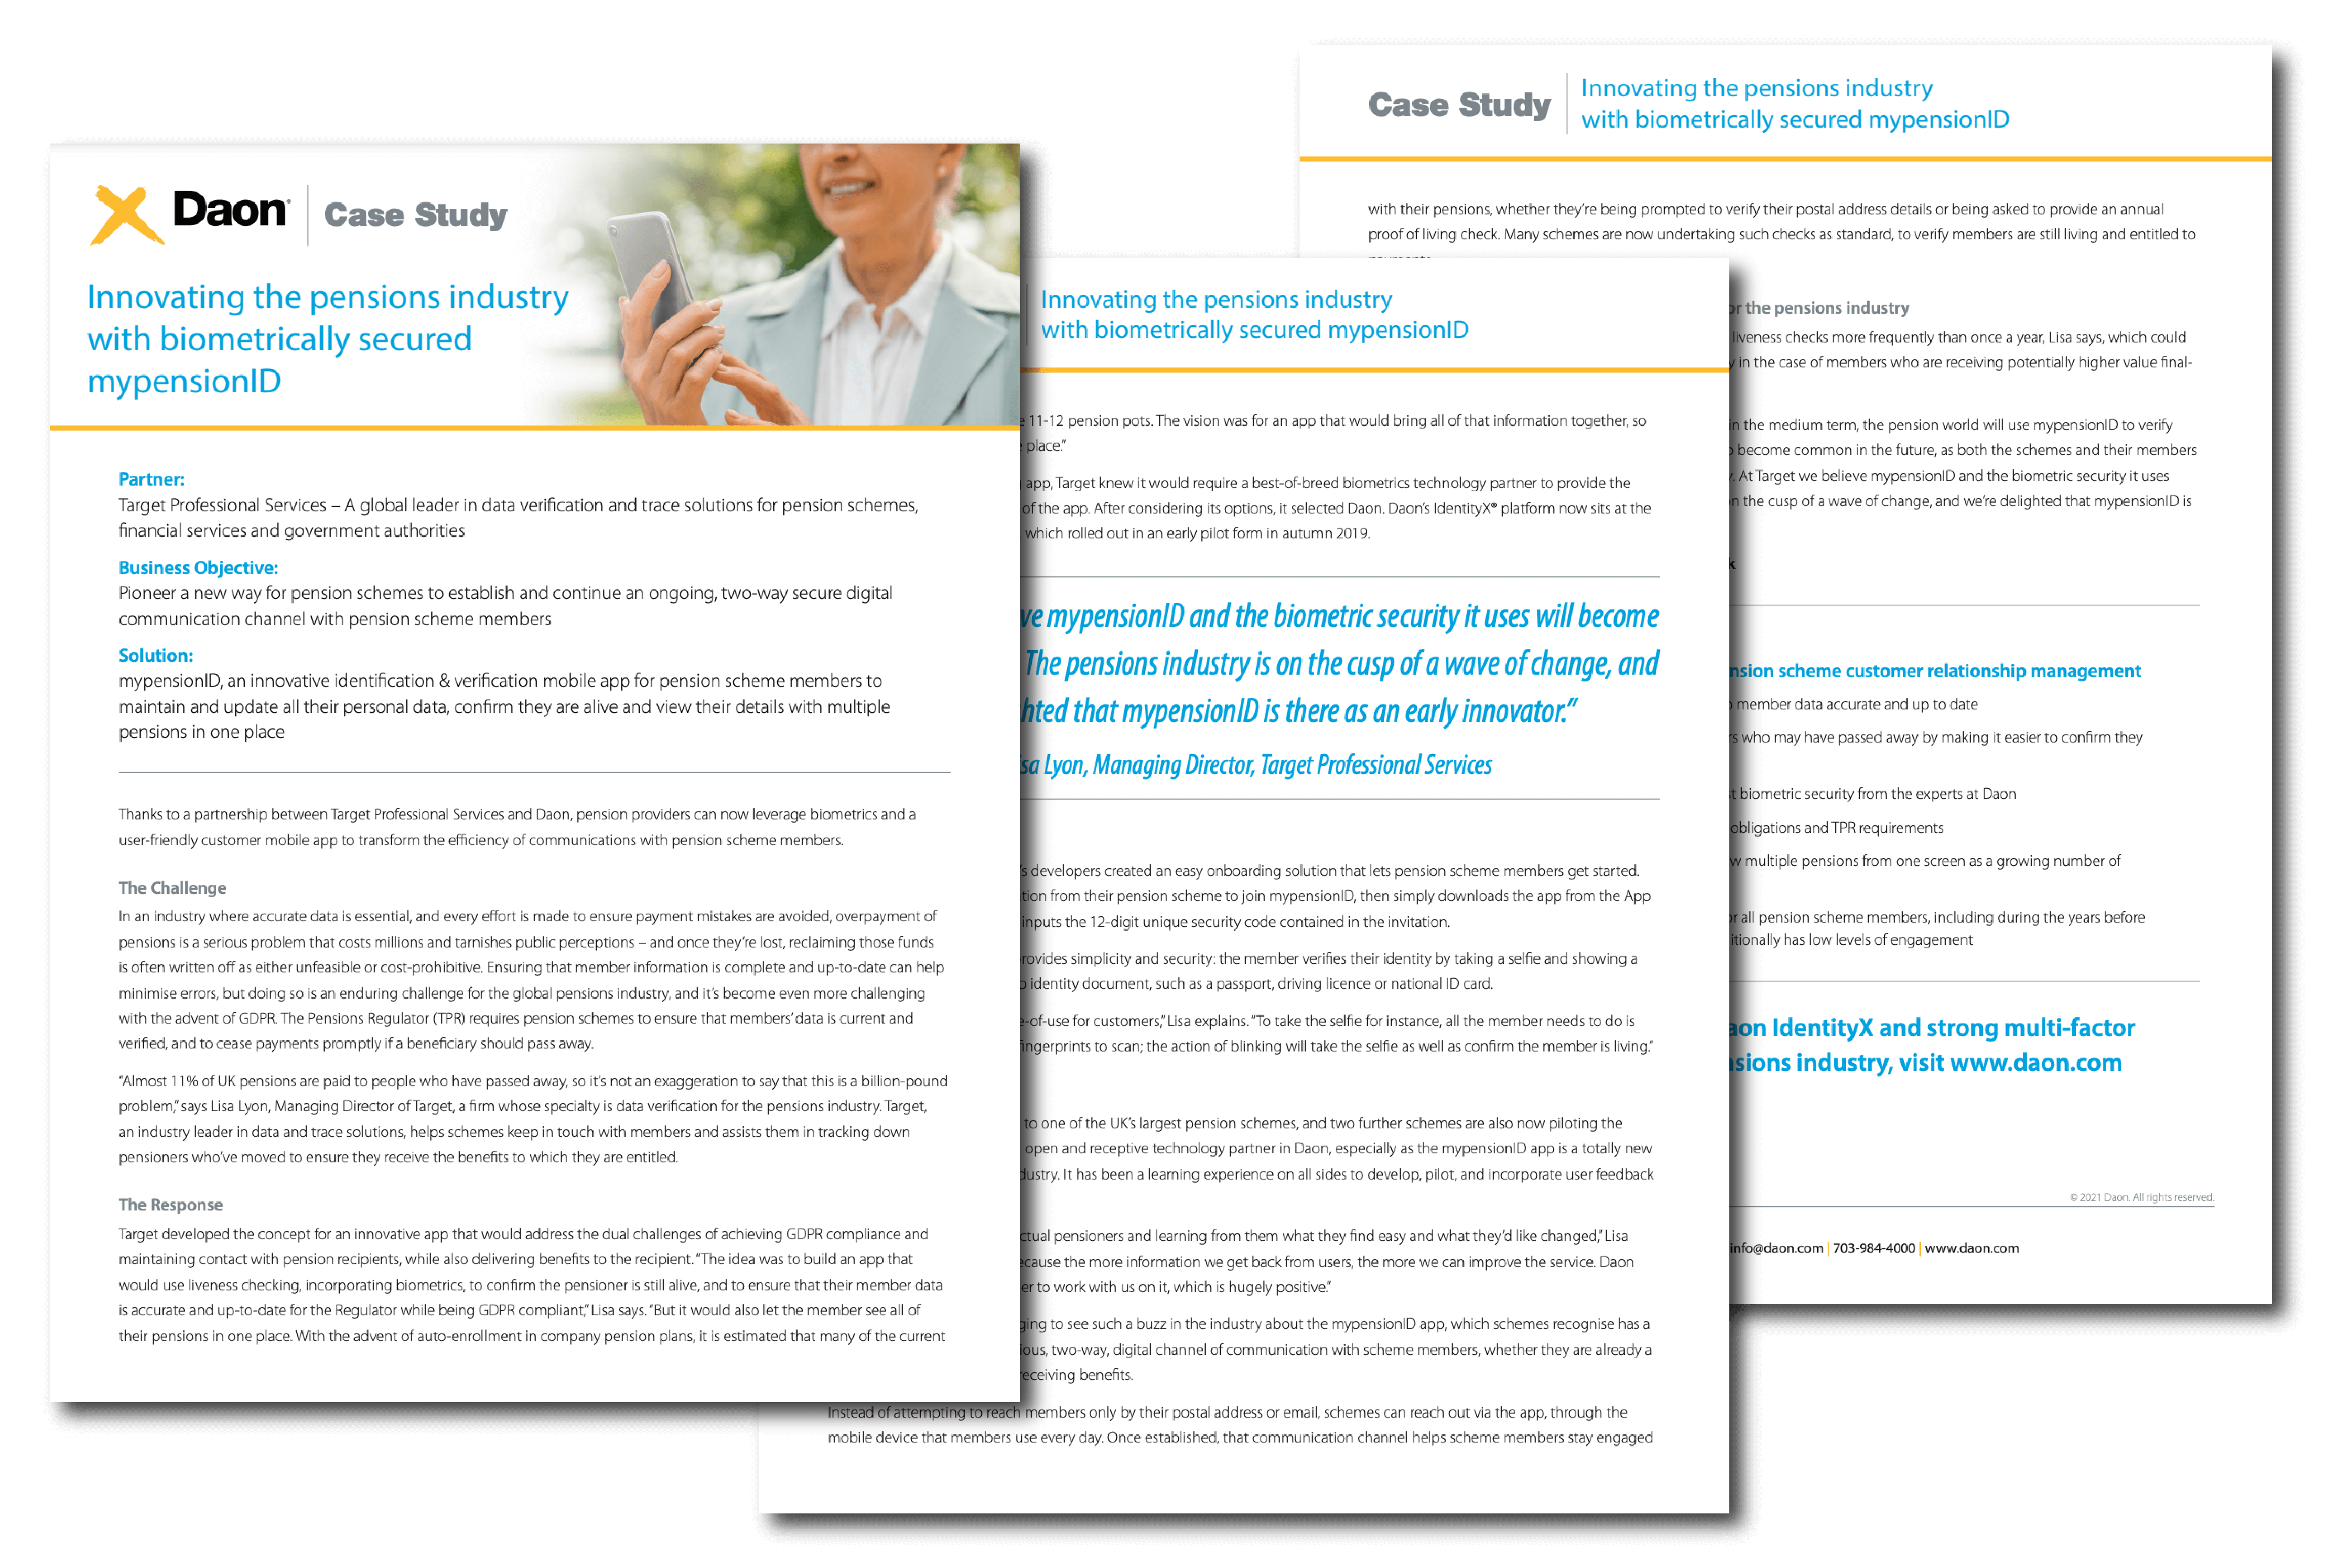 Sample of Daon's Public Customers